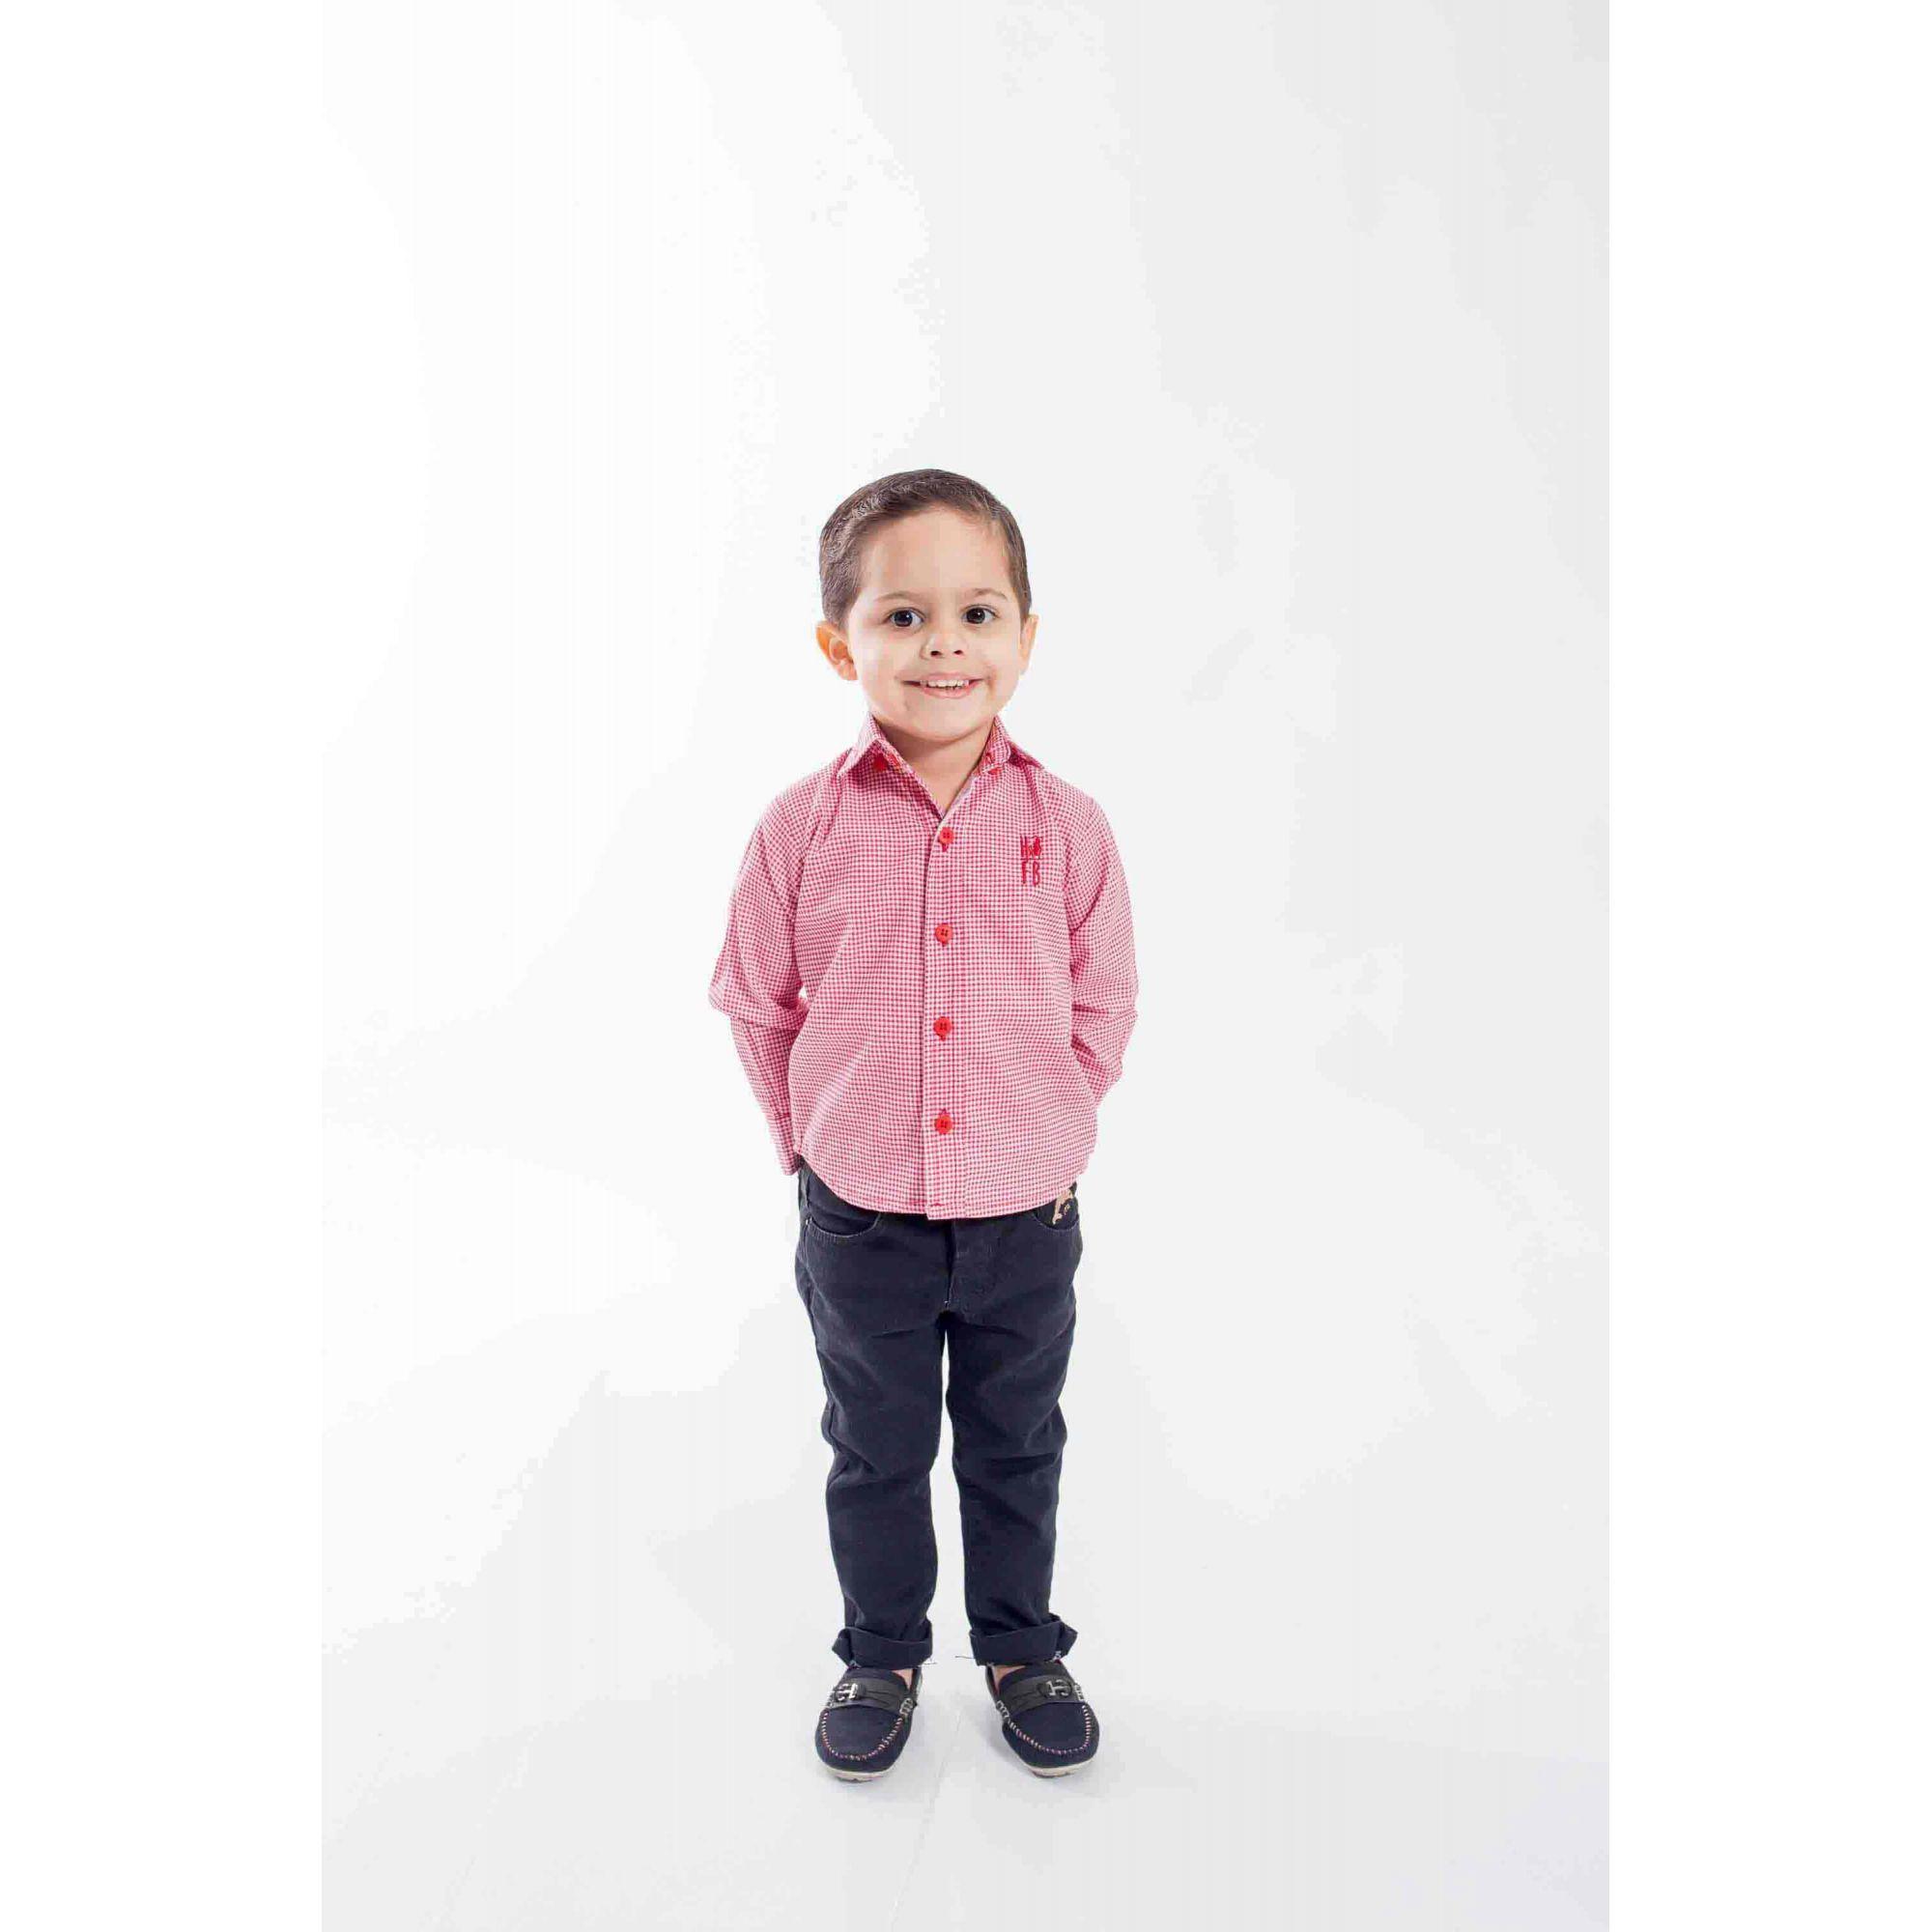 PAI E FILHO > Camisas Social Jackie Chan - Xadrez Vermelha [Coleção Tal Pai Tal Filho]  - Heitor Fashion Brazil